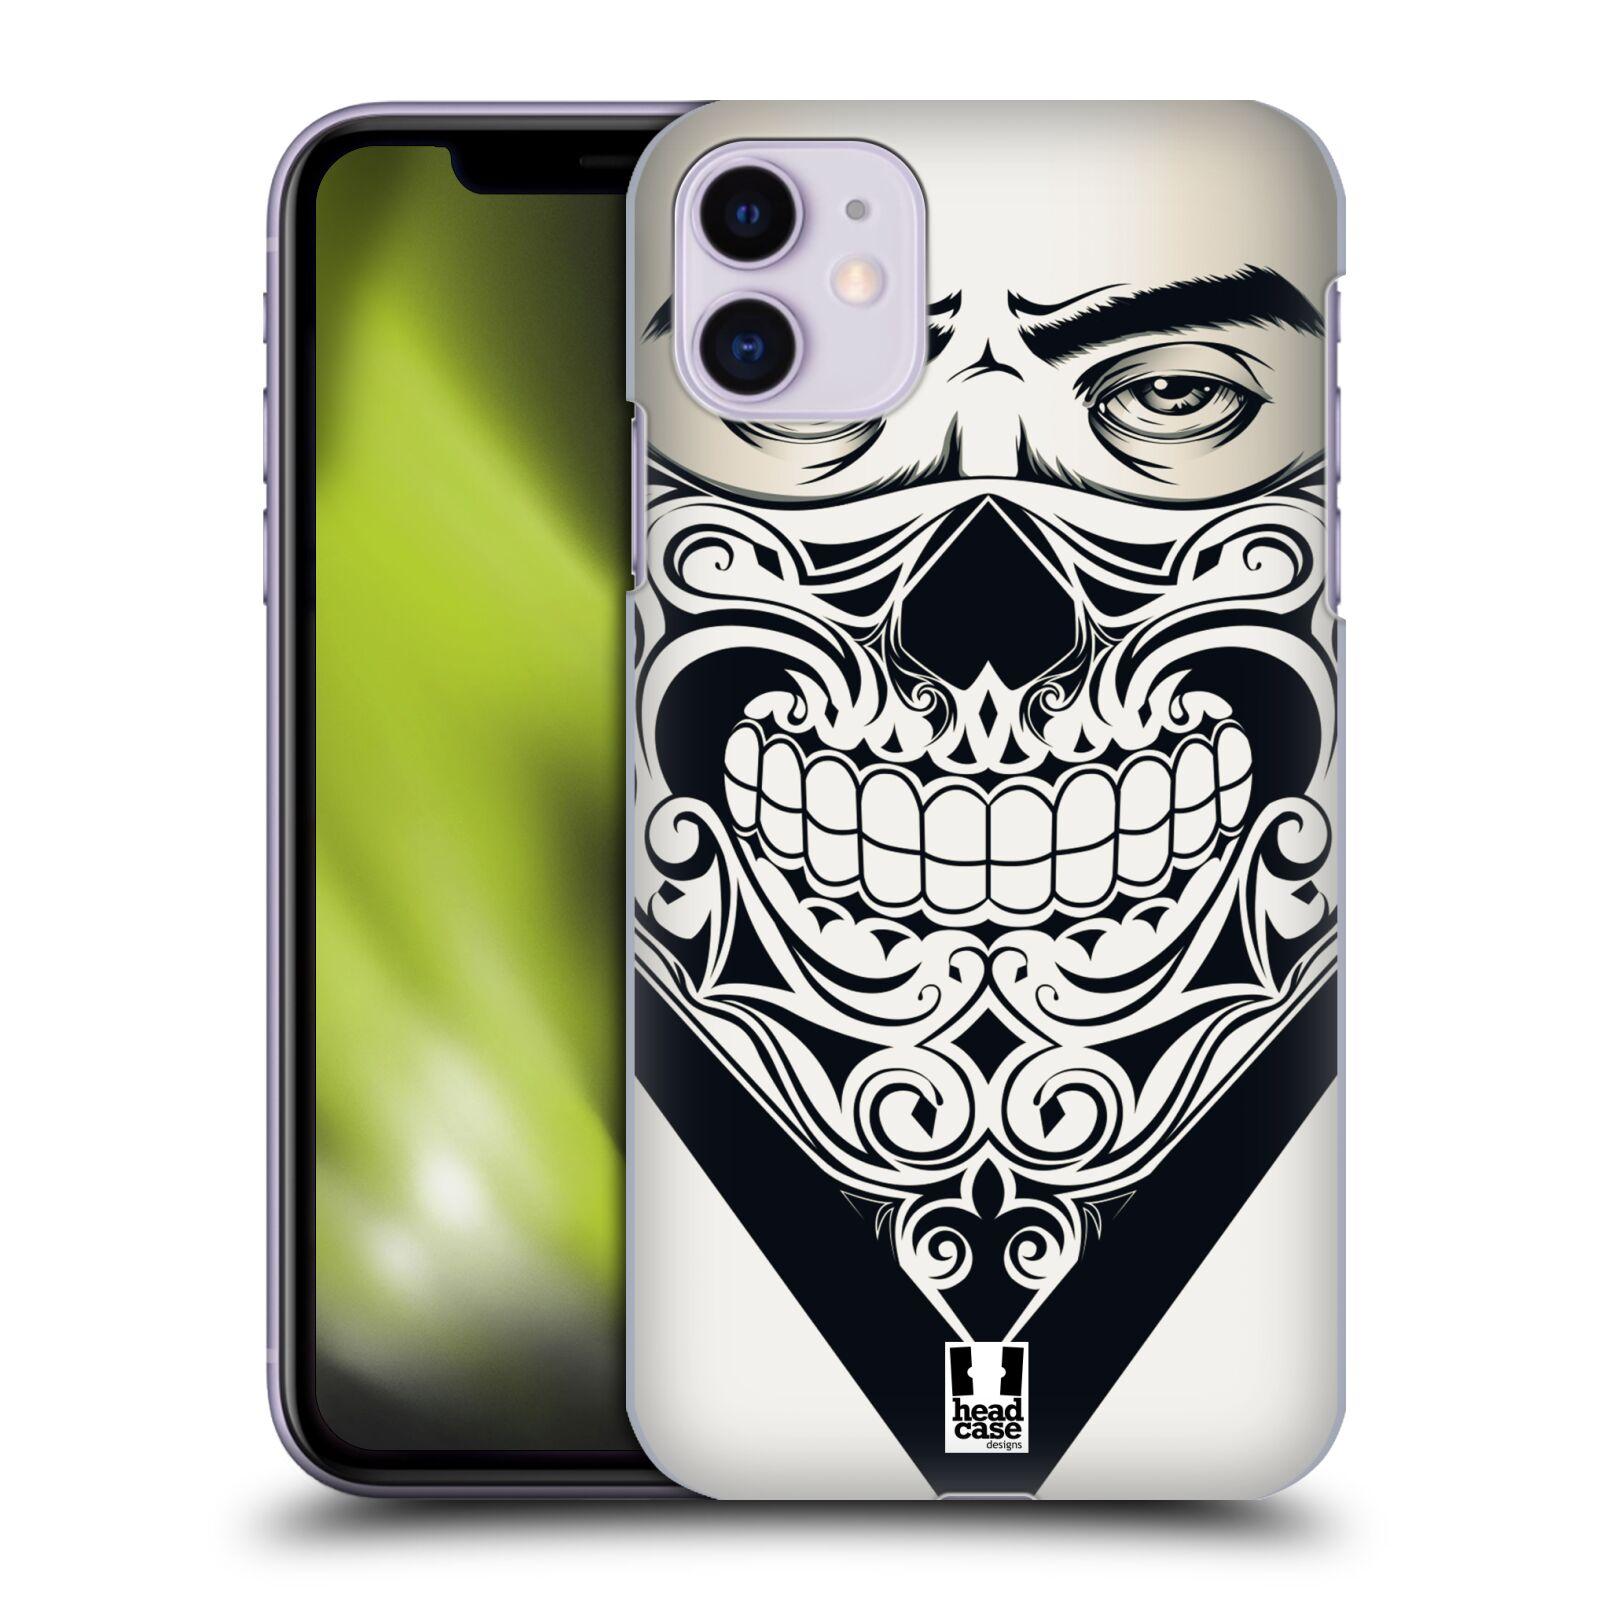 Plastové pouzdro na mobil Apple iPhone 11 - Head Case - LEBKA BANDANA